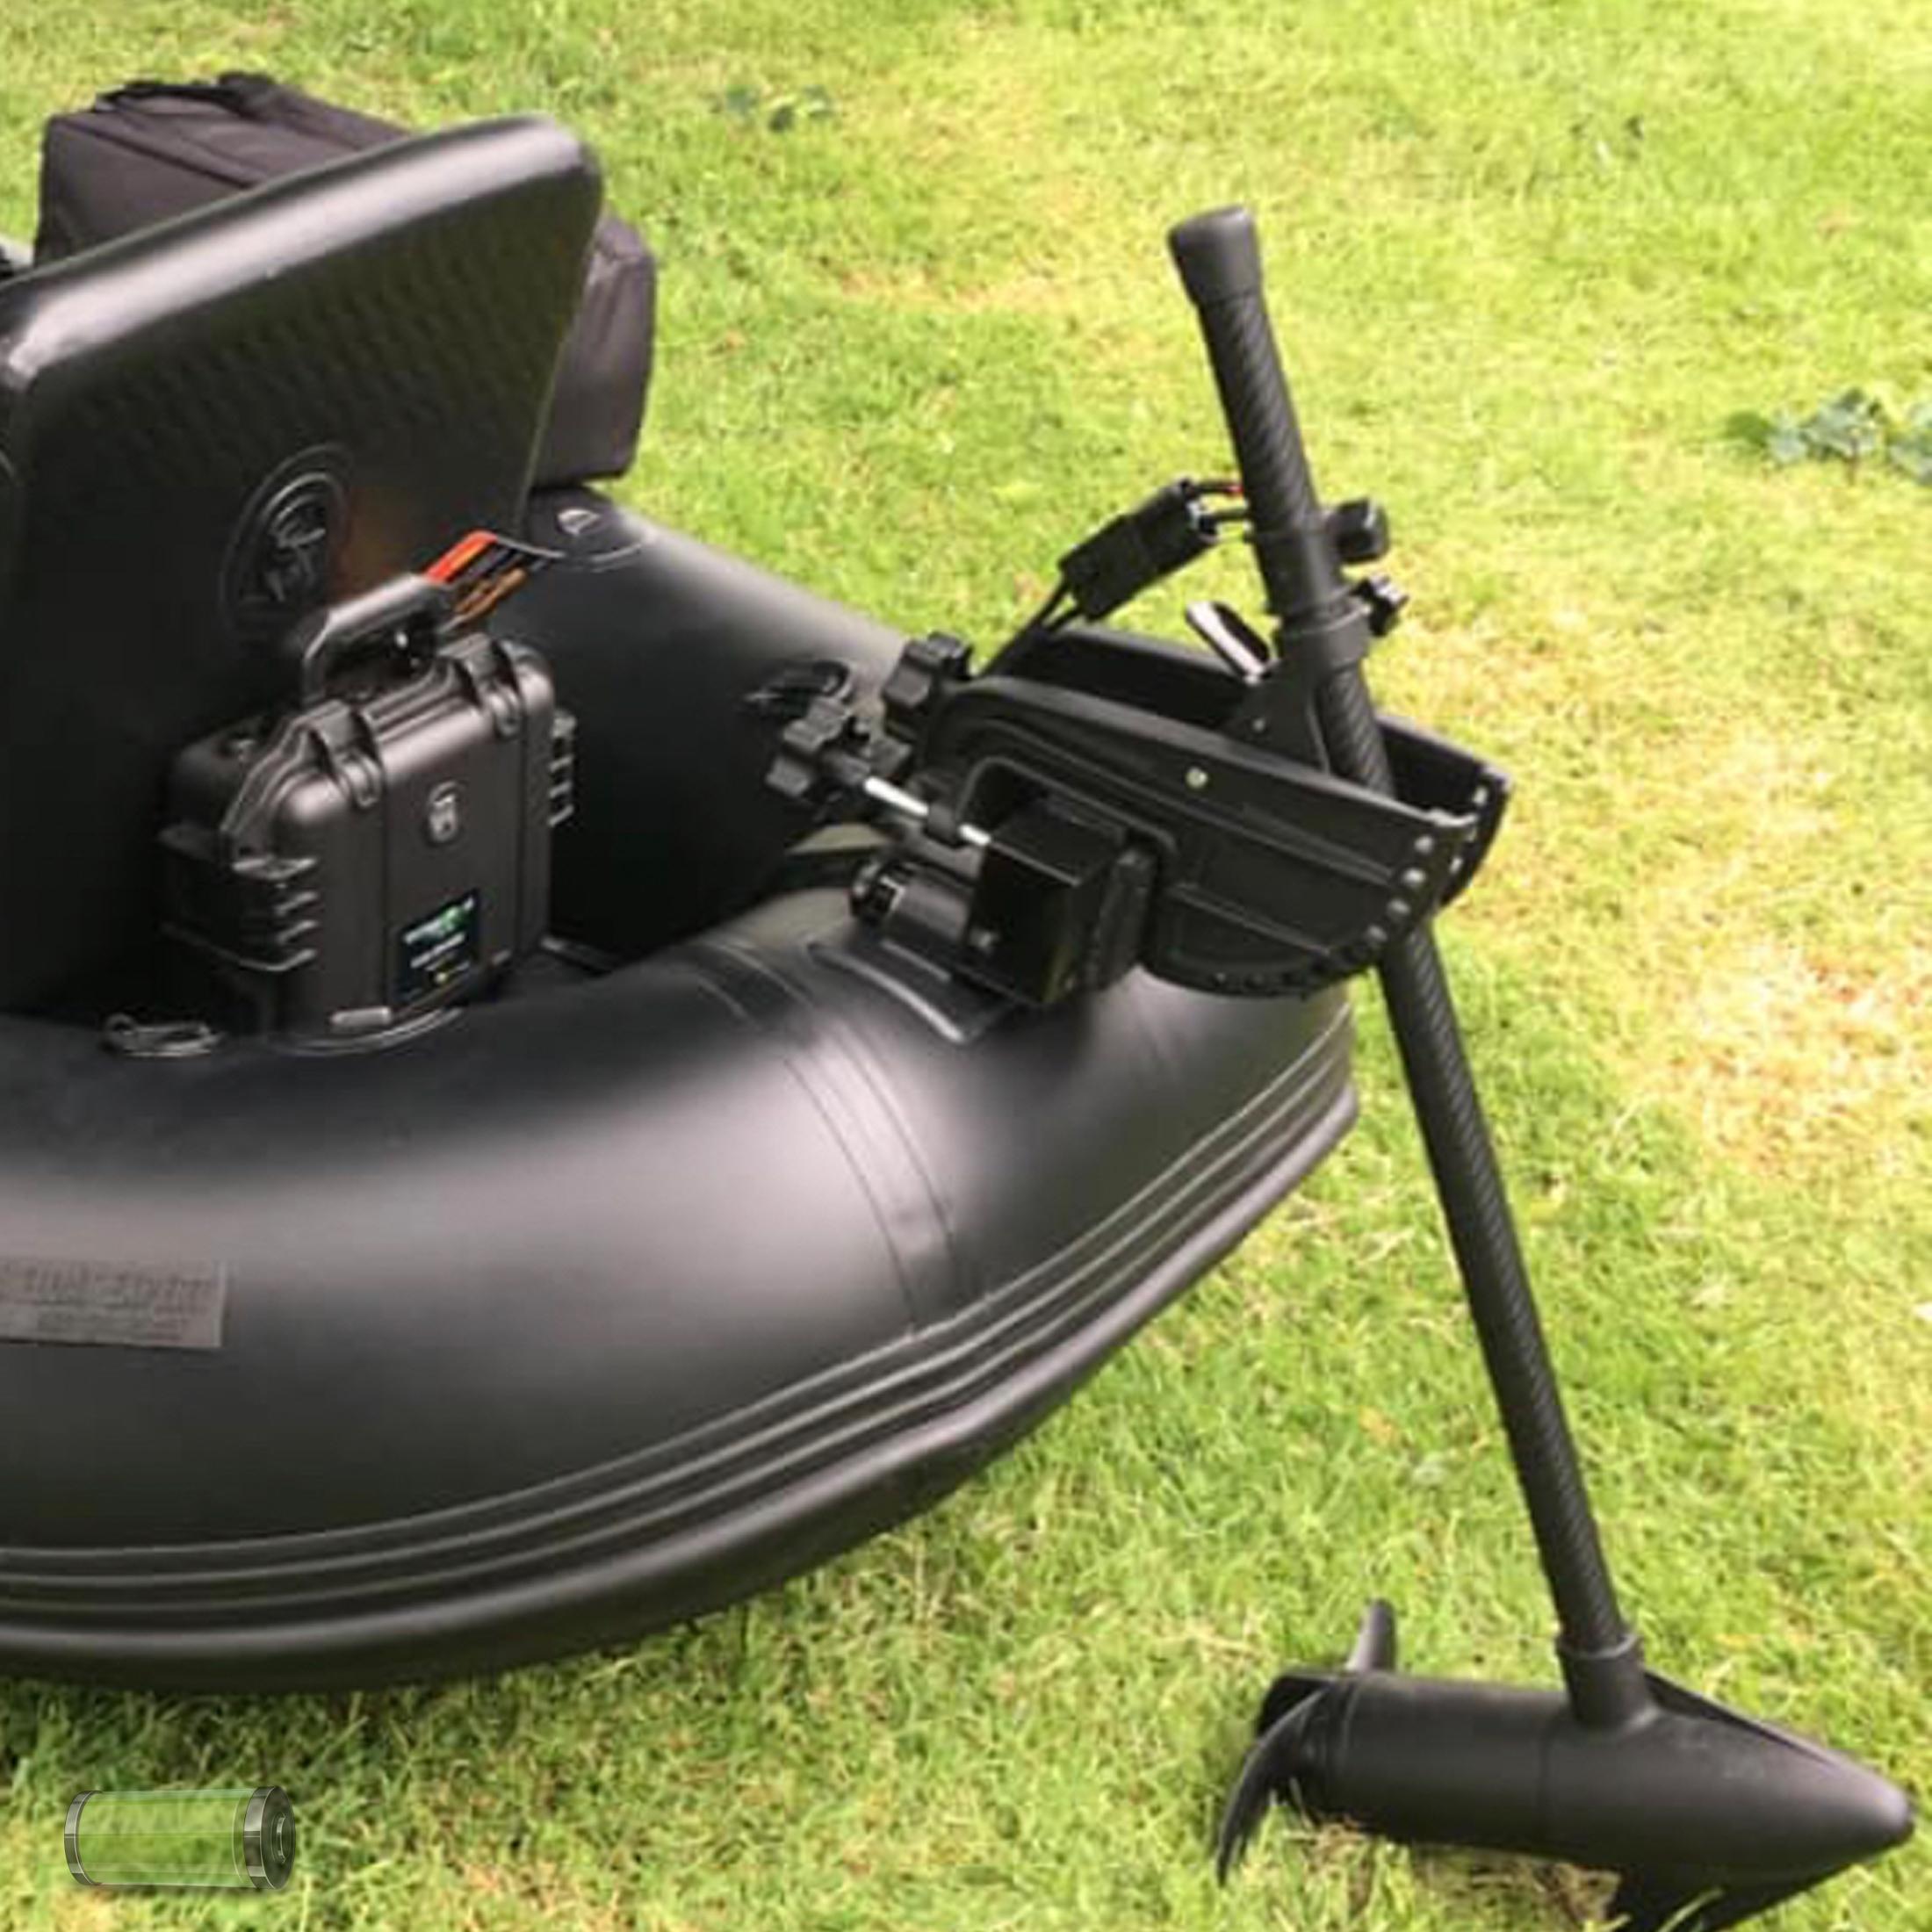 Fluistermotor Minn Kota Endura 12V 40lbs voor Belly Boat 91,4cm